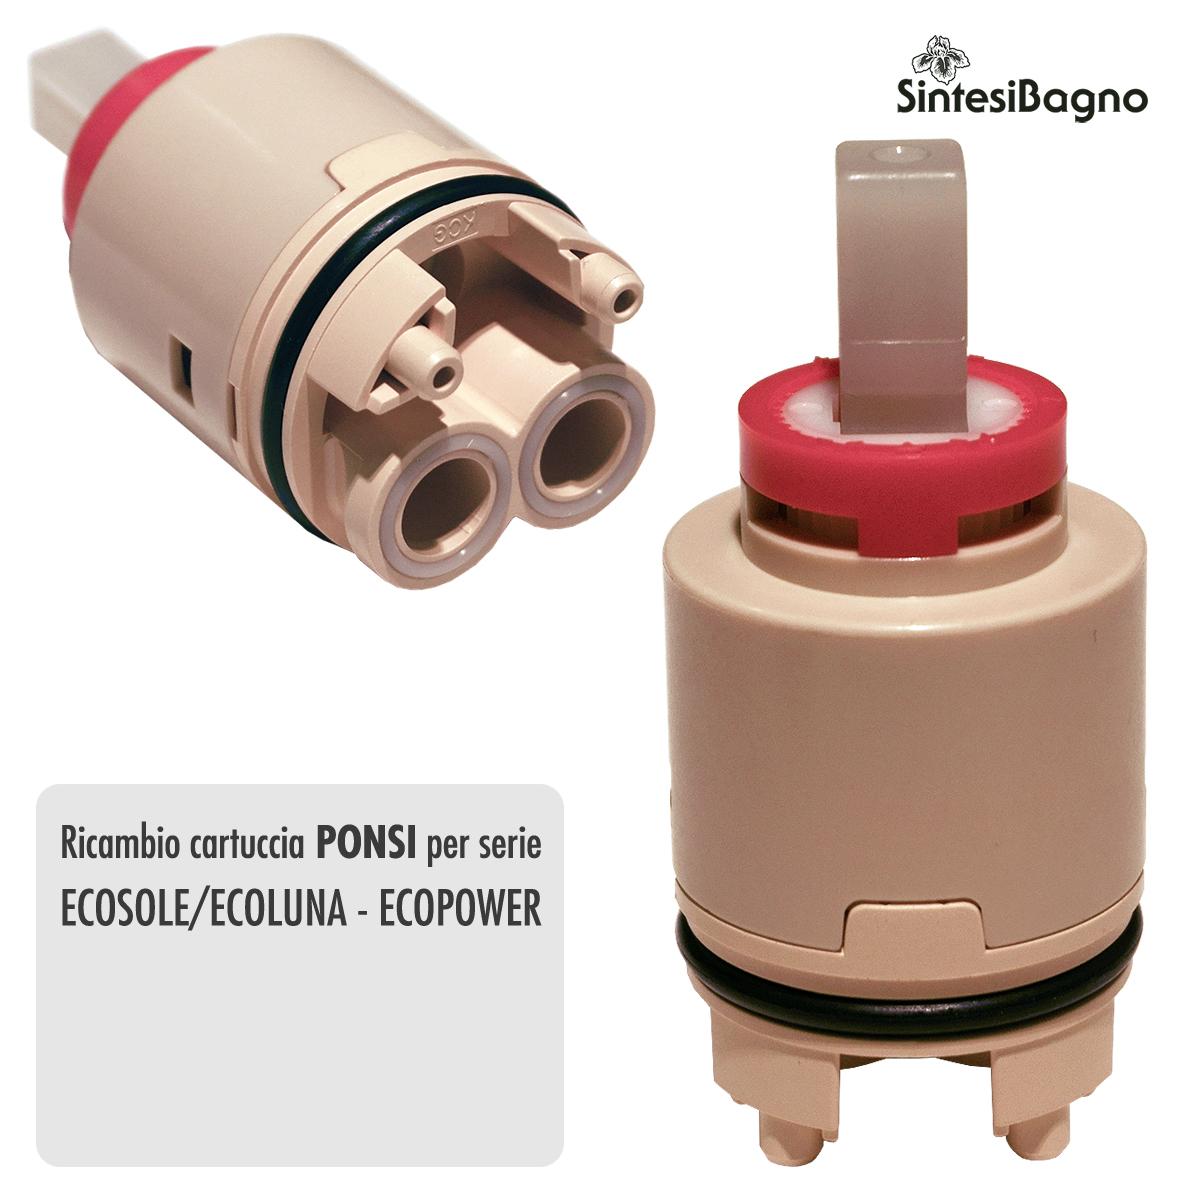 Cartuccia PONSI Ø 35 per miscelatore ECOSOLE/ECOLUNA/ECOPOWER - BTRICCCA05